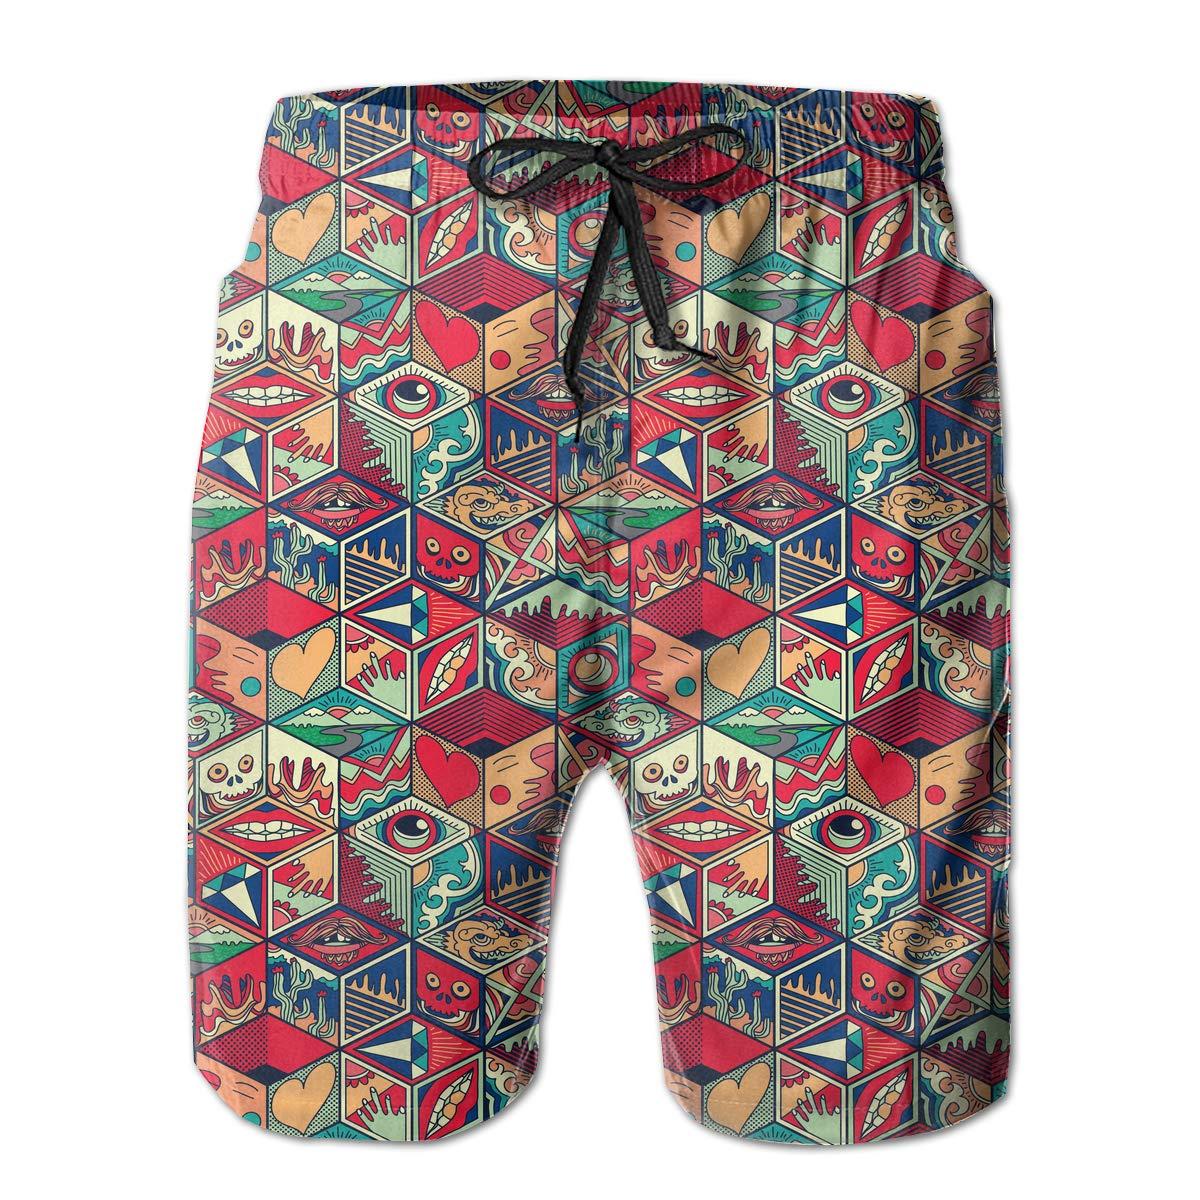 Shakumen Colorful Hexagon Tile Mens Beach Shorts Casual Running Trunks with 3 Pockets